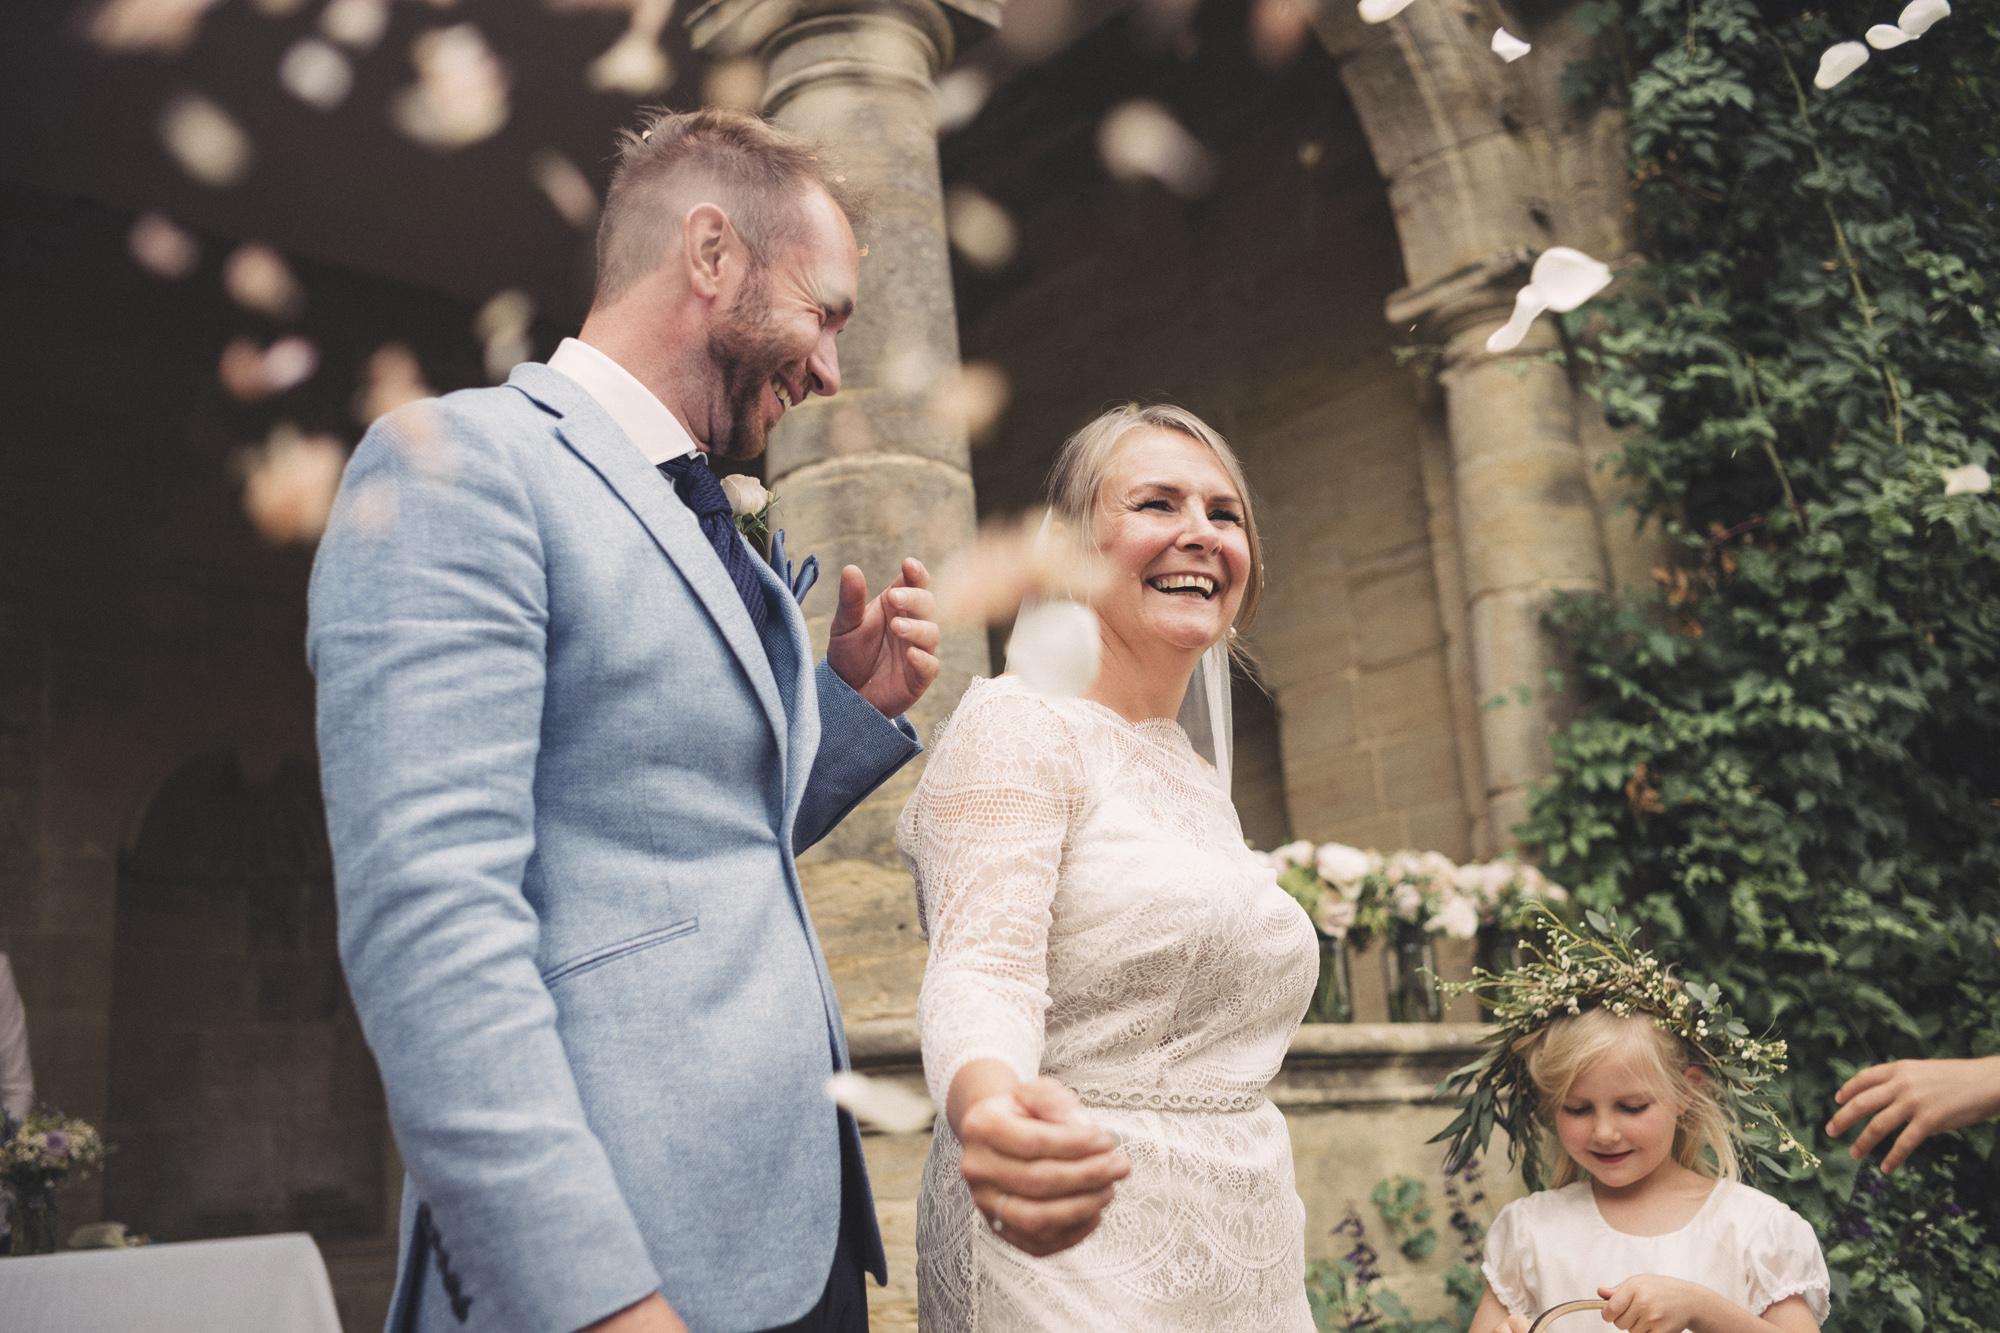 Jaz-Kate-Beaumont-Oyster-Silk-Bias-Cut-Wedding-Gown-Larkspur-Lace-Top-Sussex-Wedding-14.jpg